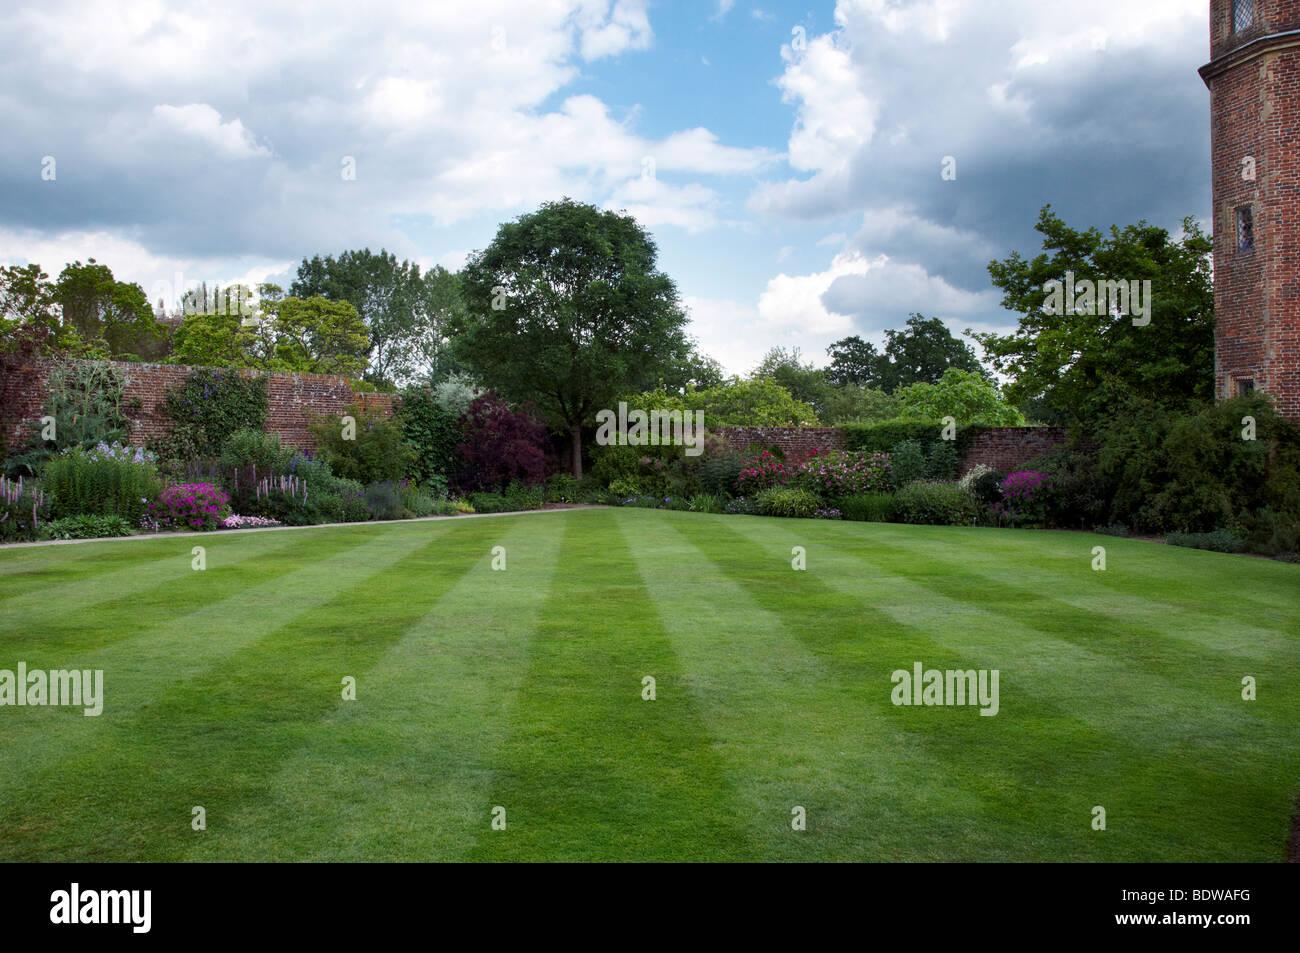 Un jardin avec une bordure herbacée Photo Stock